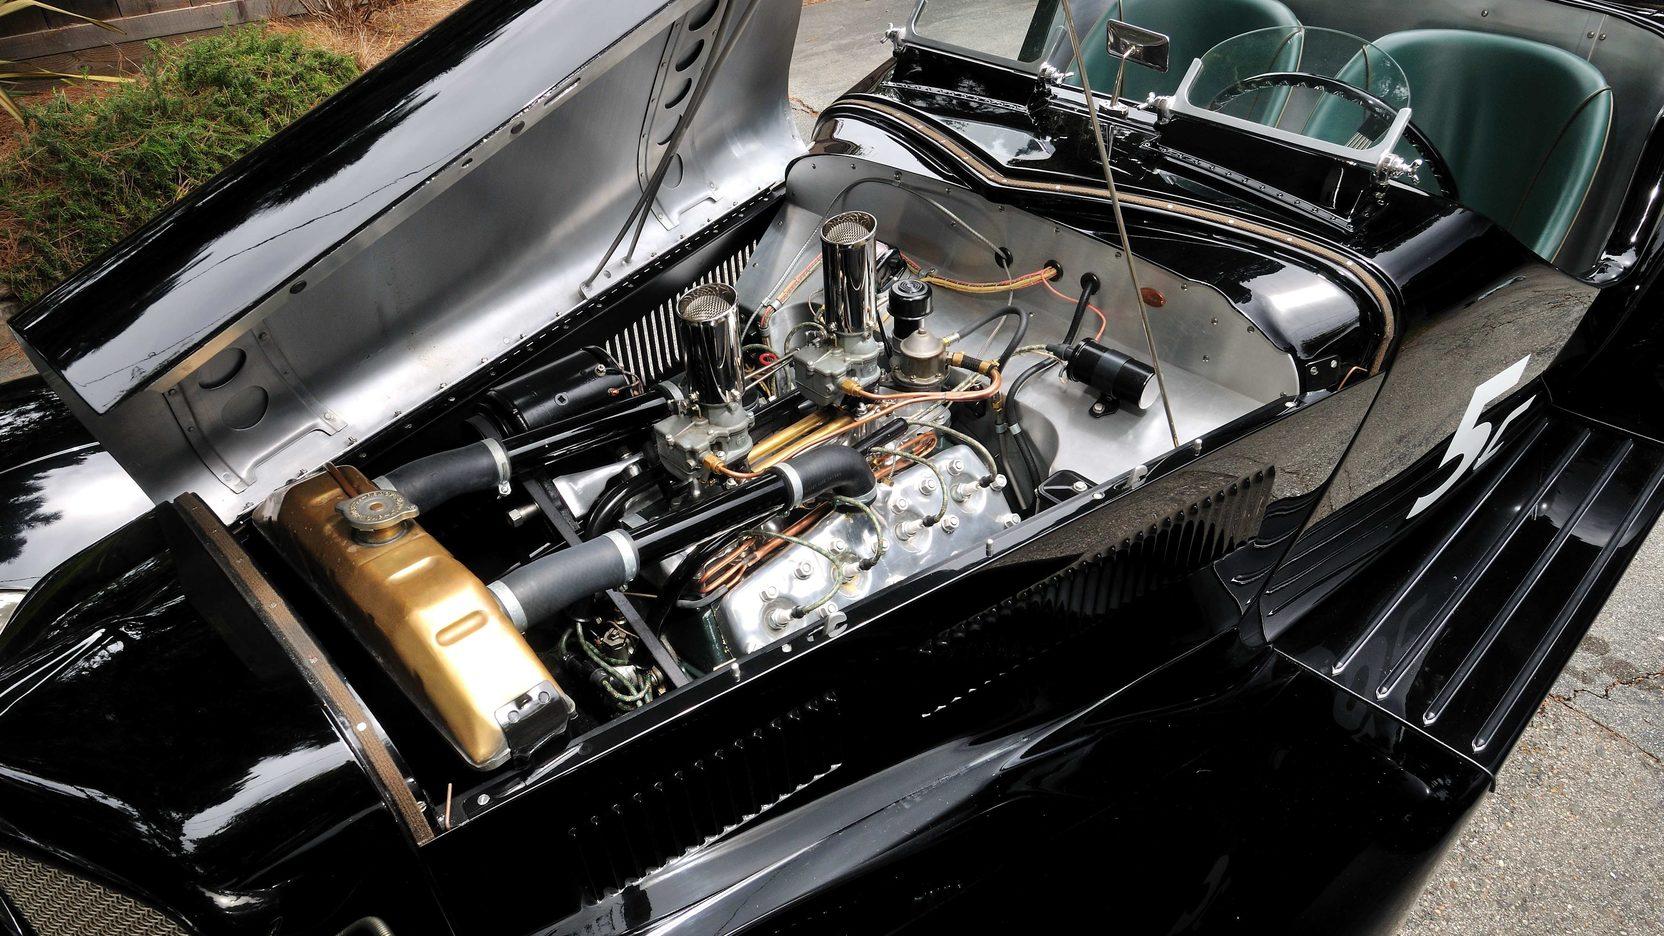 1933 Ford Auburn Special engine